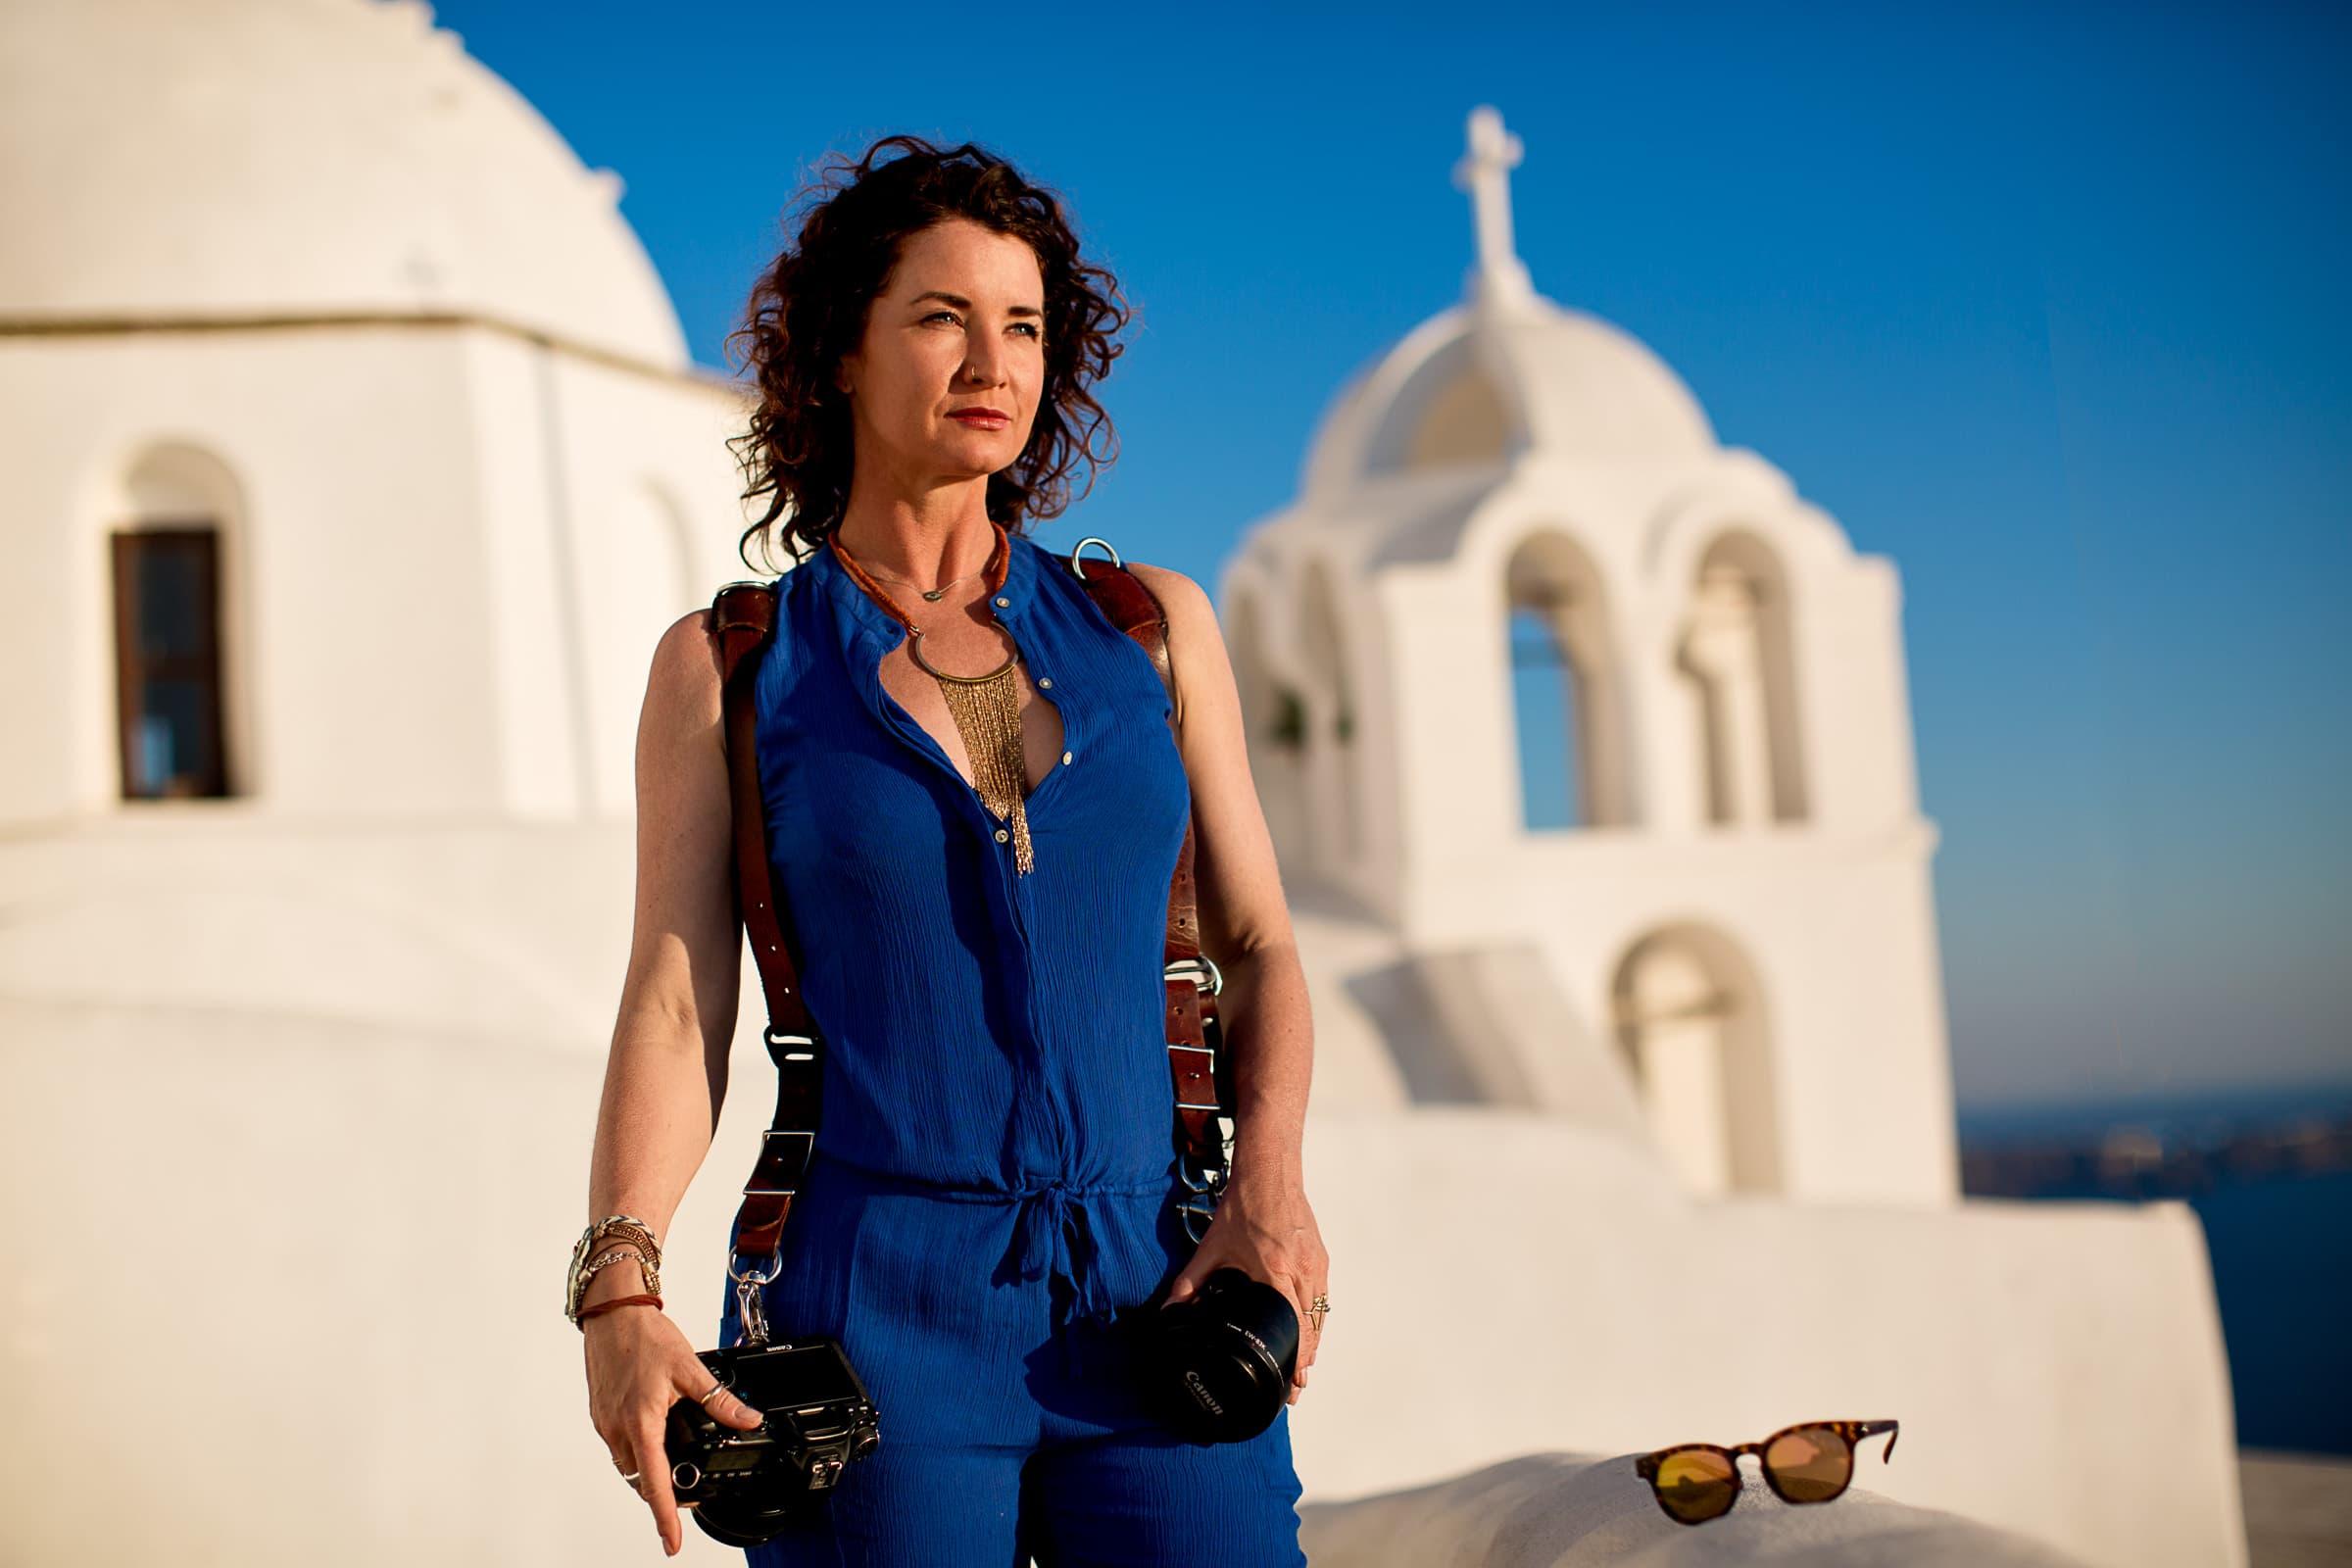 Award winning wedding photographer Tree Marie WoodSmith portrait while exploring Santorini Engagement photo ideas